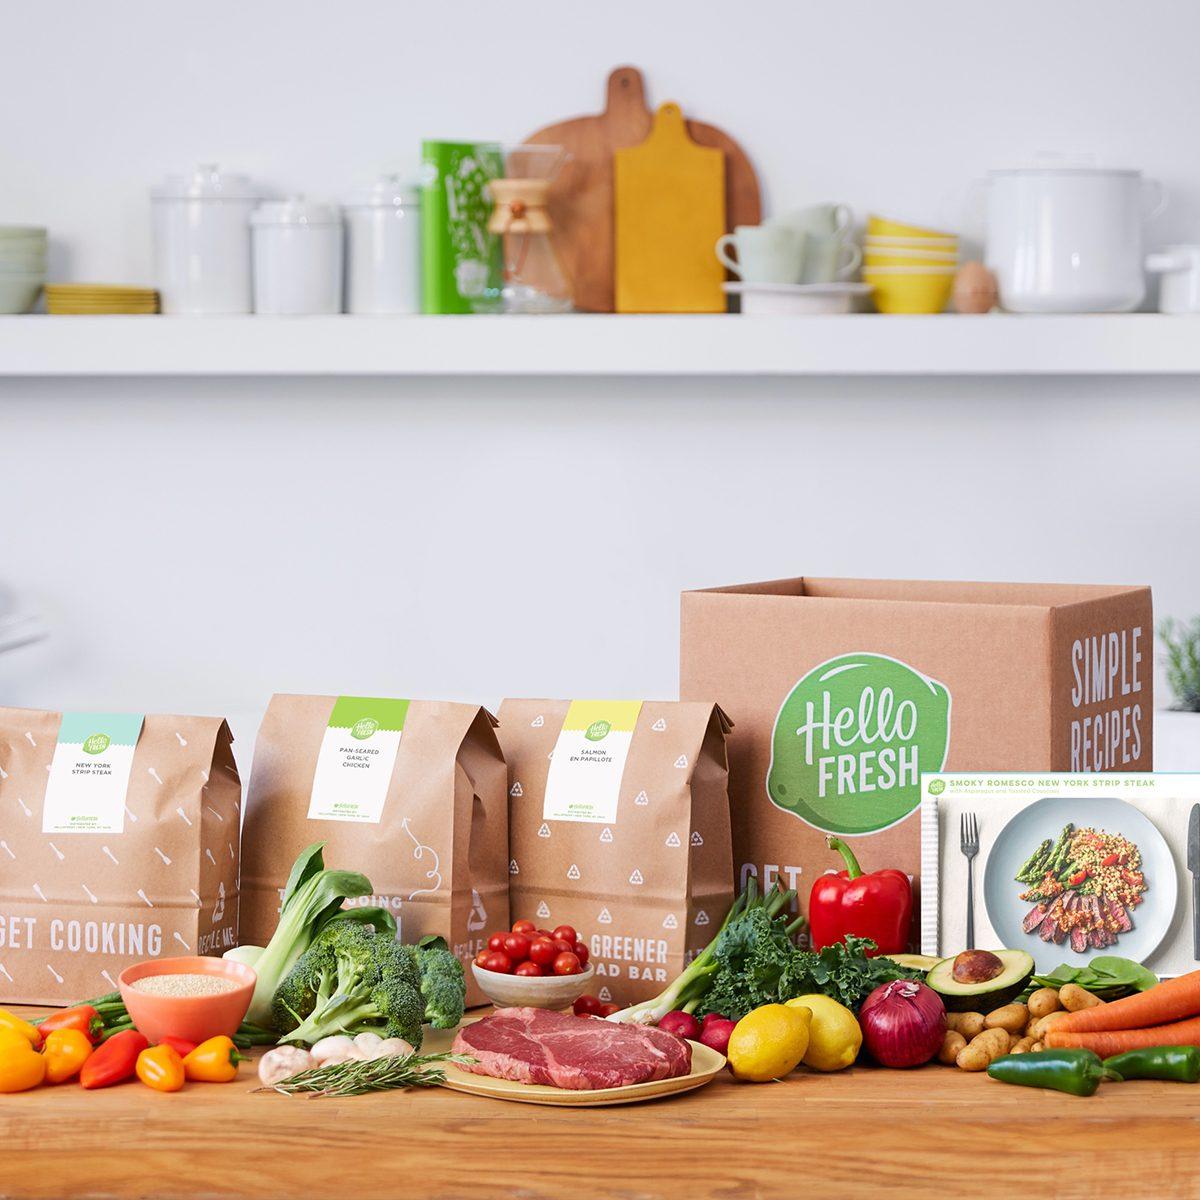 Hello Fresh meal kits